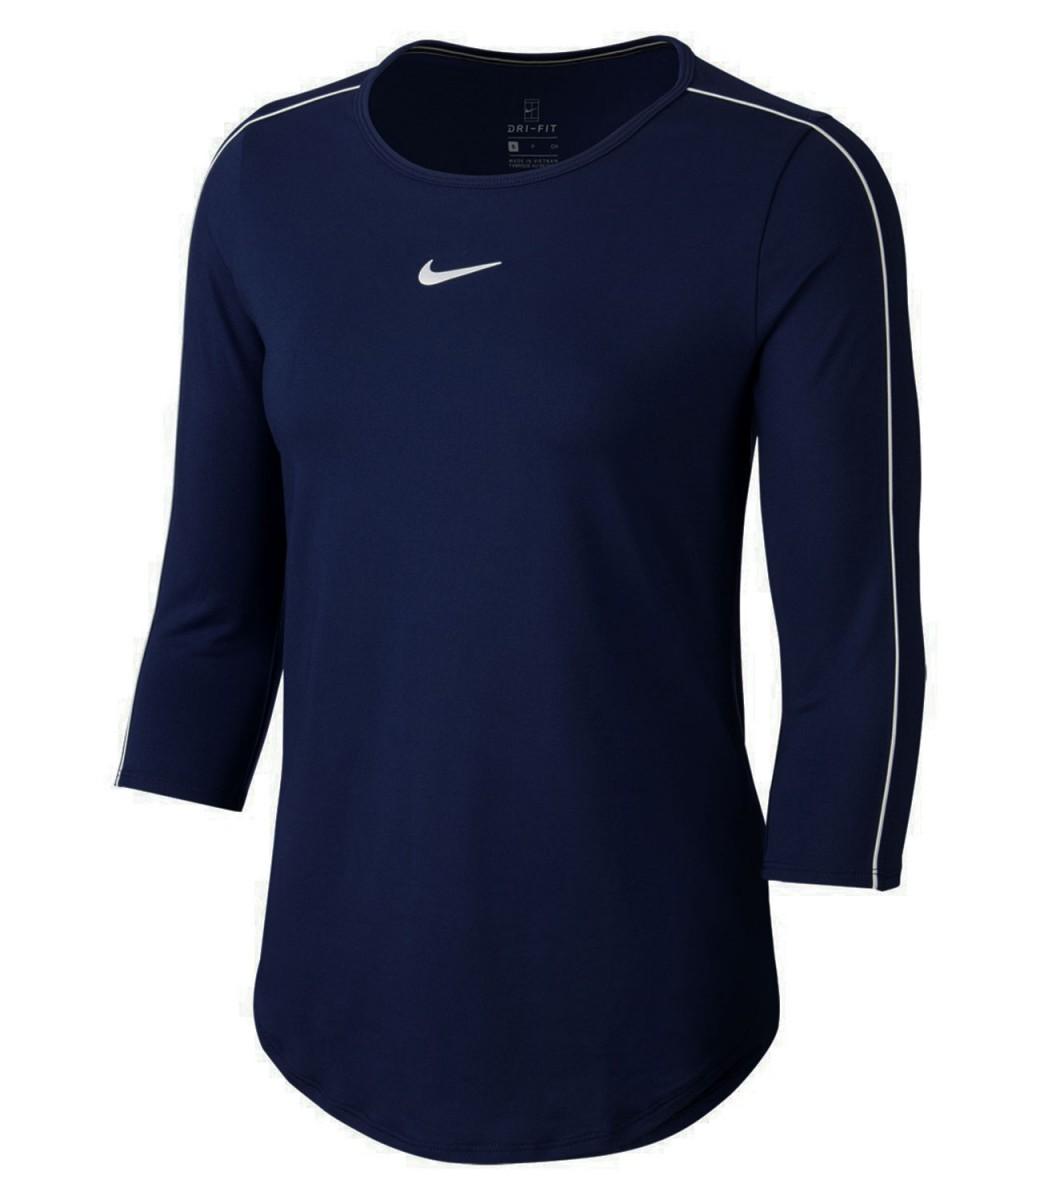 Теннисная футболка женская Nike Court Women 3/4 Sleeve Top obsidian/white